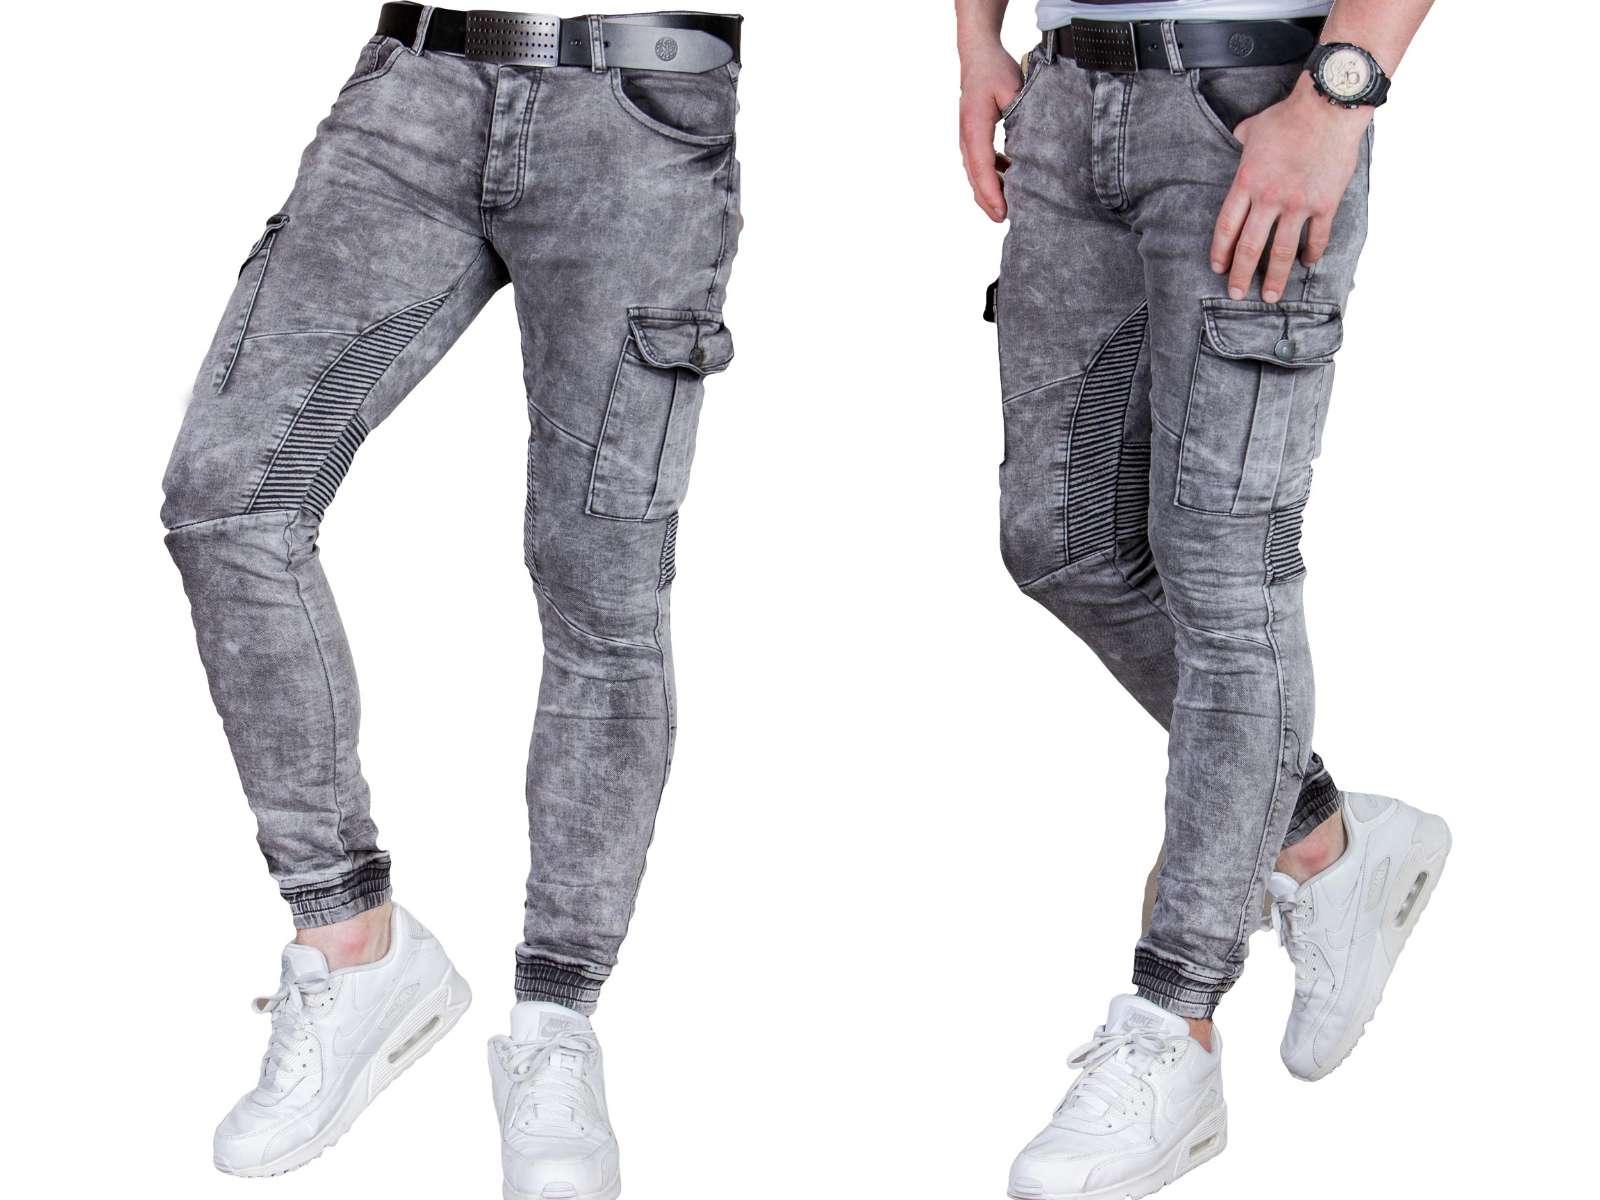 Spodnie joggery grafit zs736-11 fashionmen2 r. 36 - 7135818350 ... 263a648143